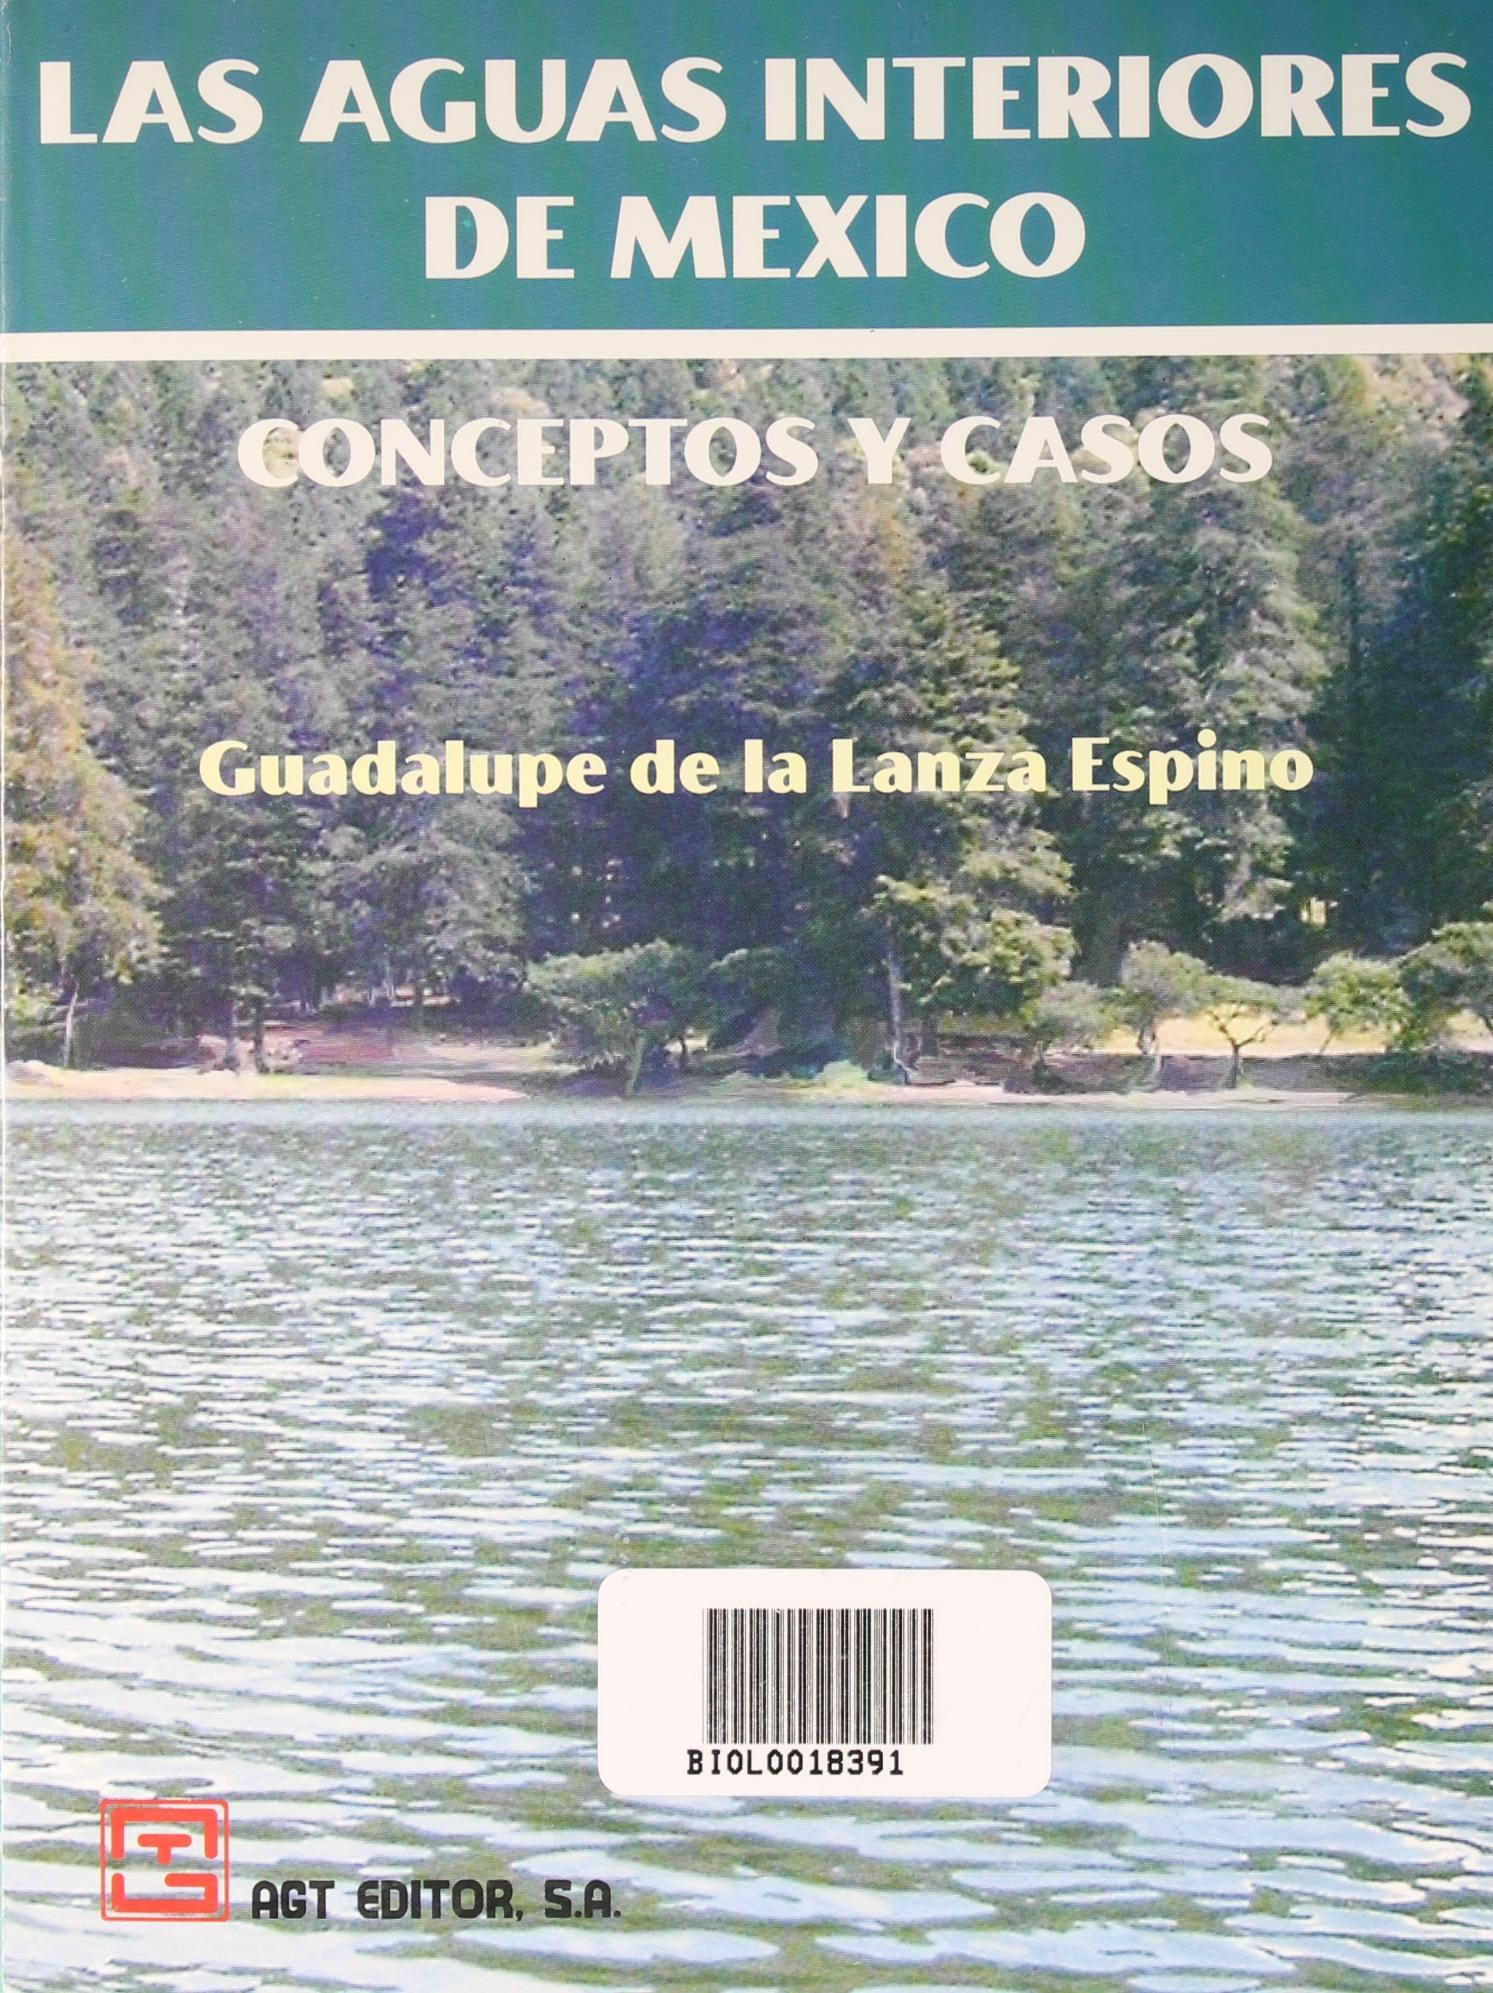 Las aguas interiores de México